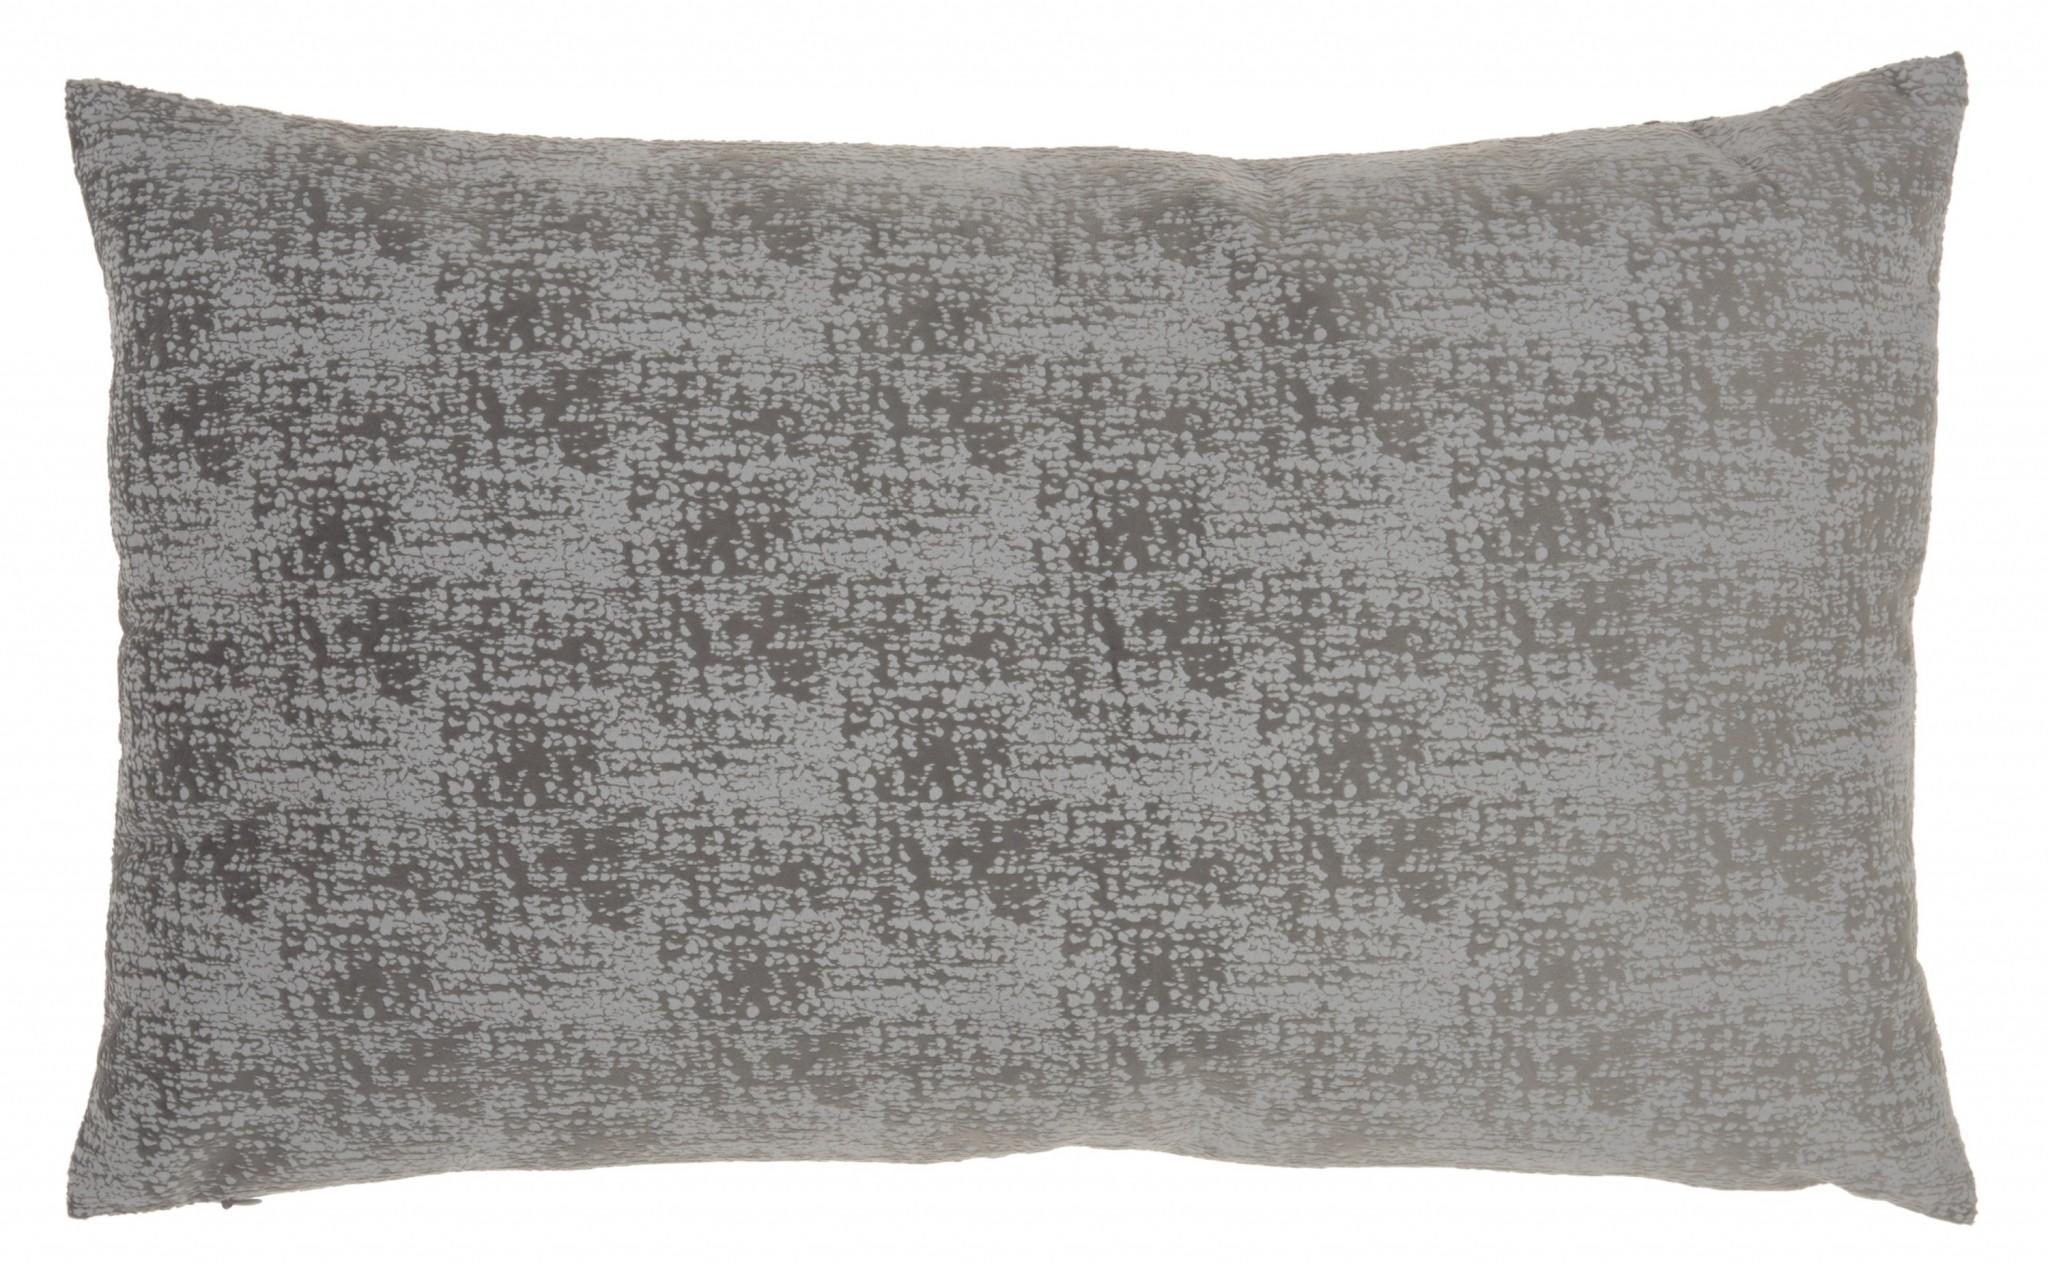 Slate Gray Distressed Gradient Lumbar Pillow